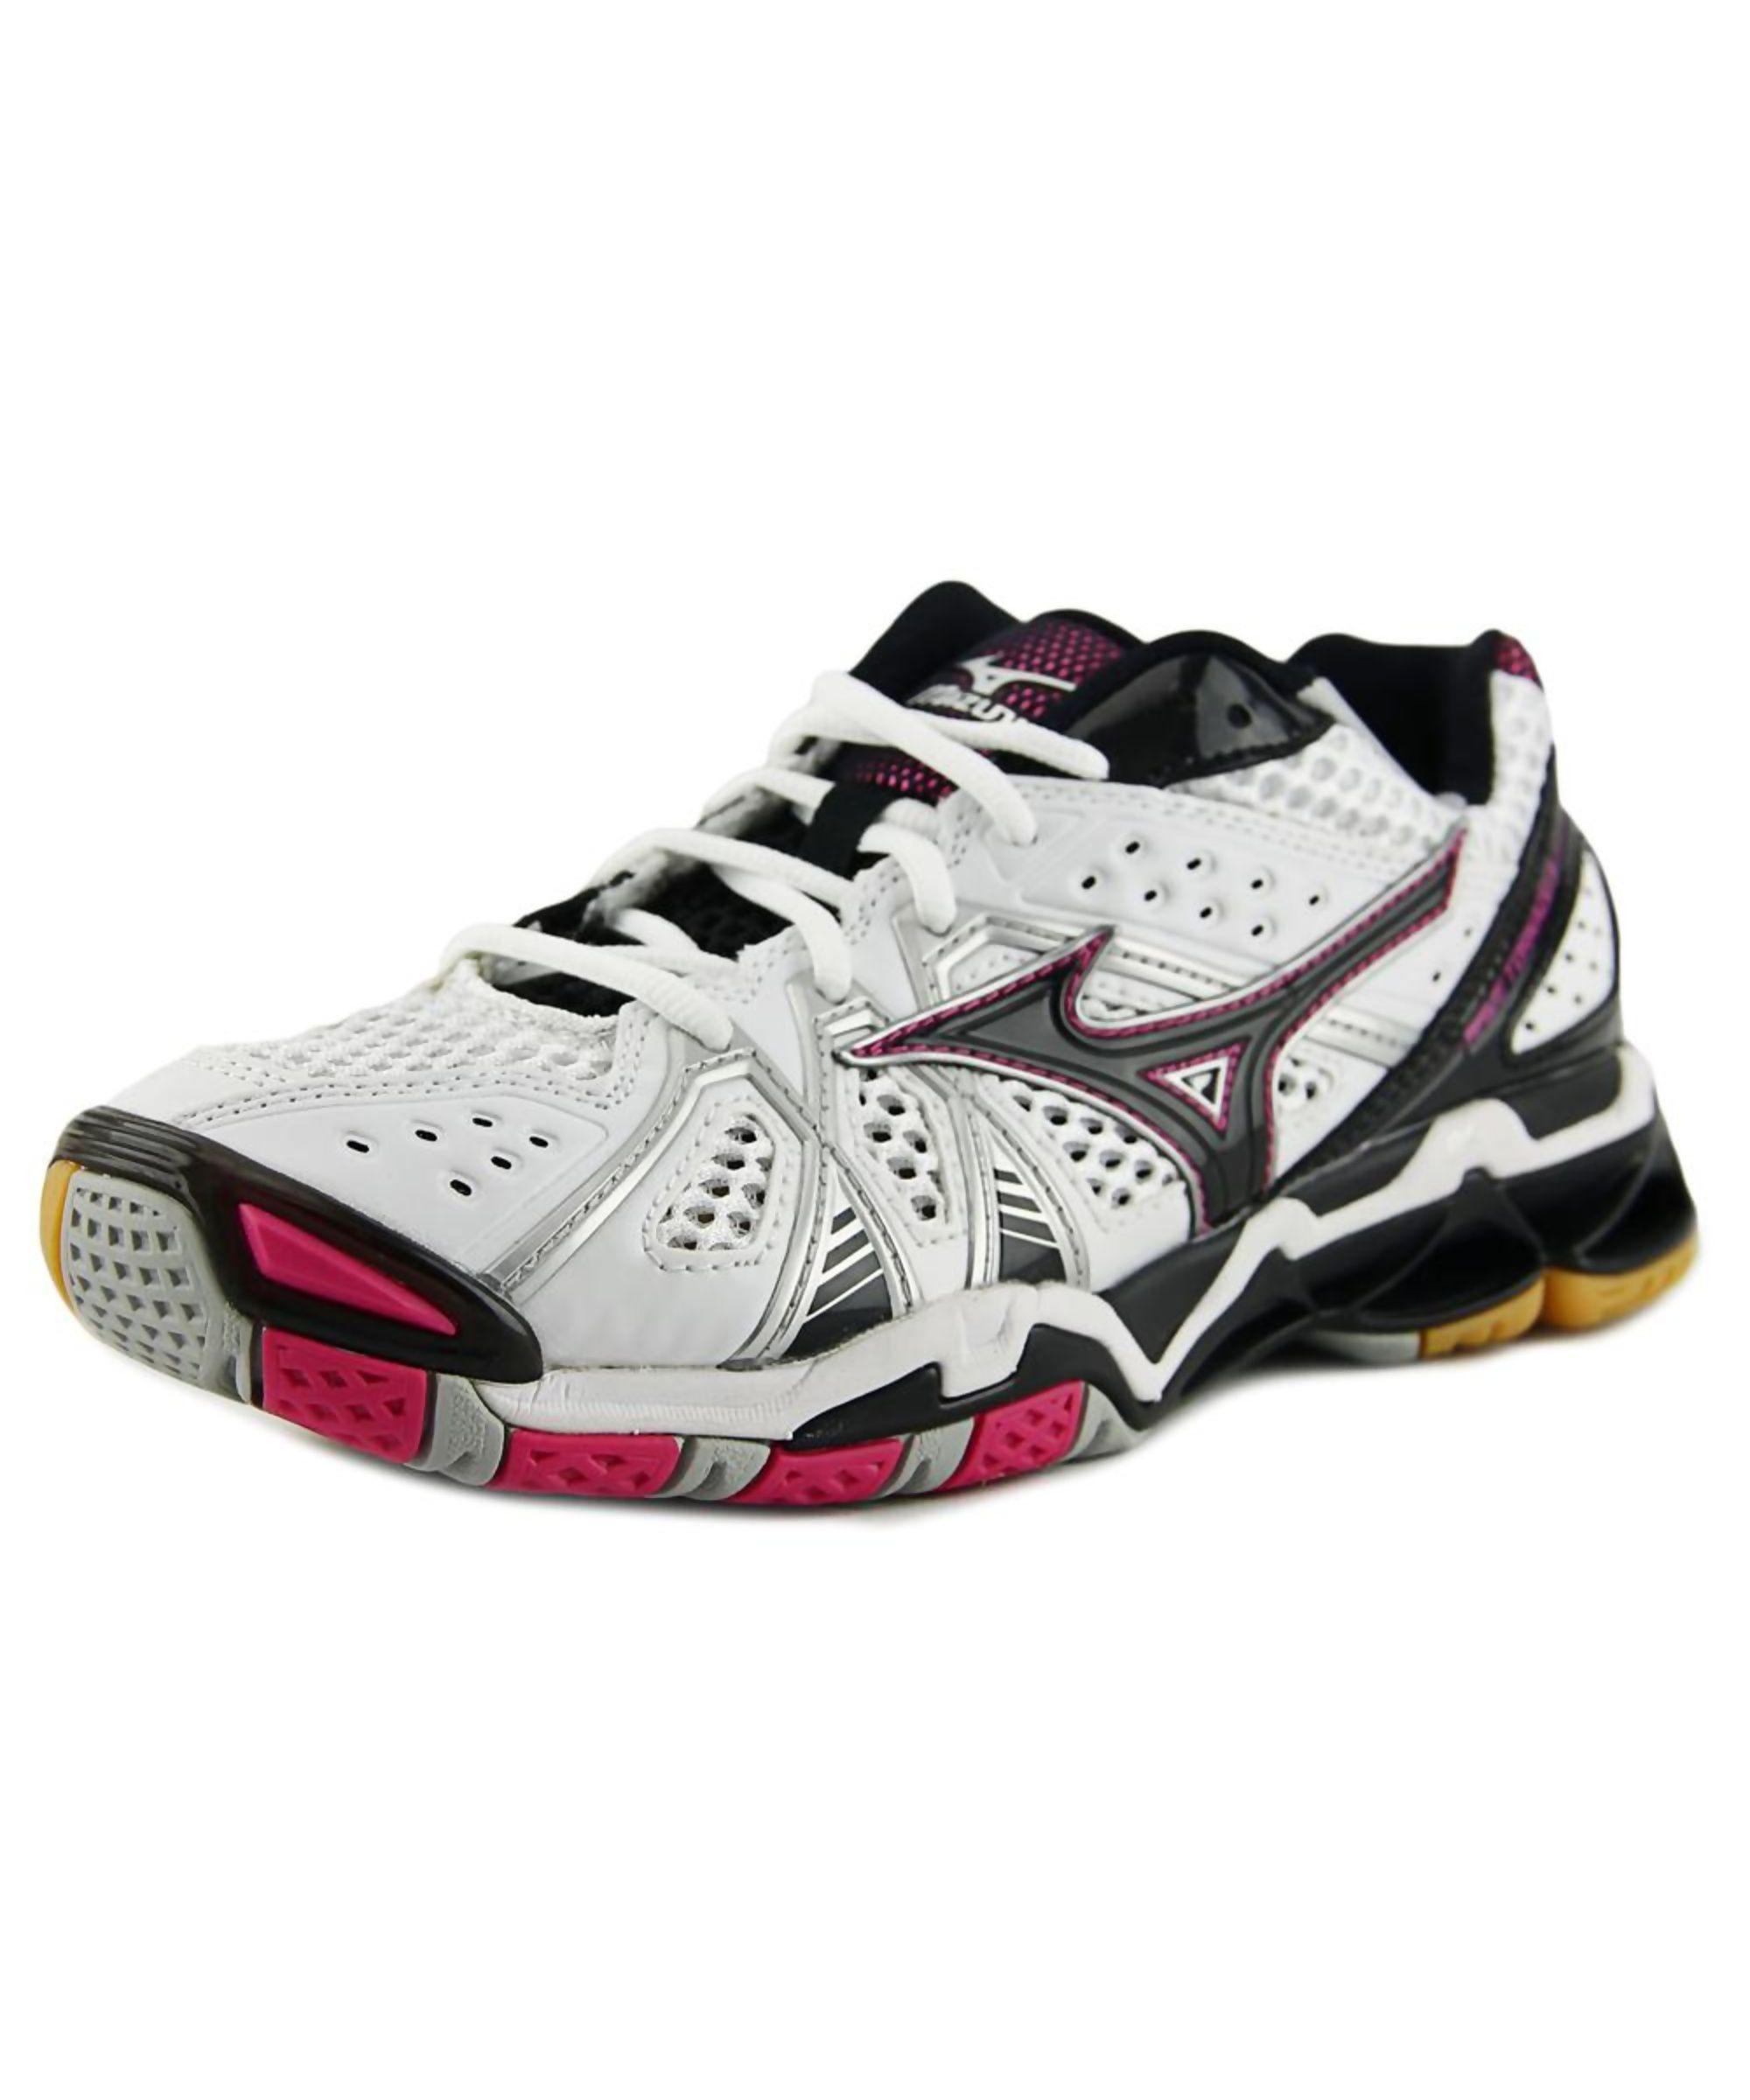 Mizuno Mizuno Wave Tornado 9 Round Toe Synthetic Sneakers Shoes Sneakers Mizuno Volleyball Shoes Mens Volleyball Shoes Best Volleyball Shoes